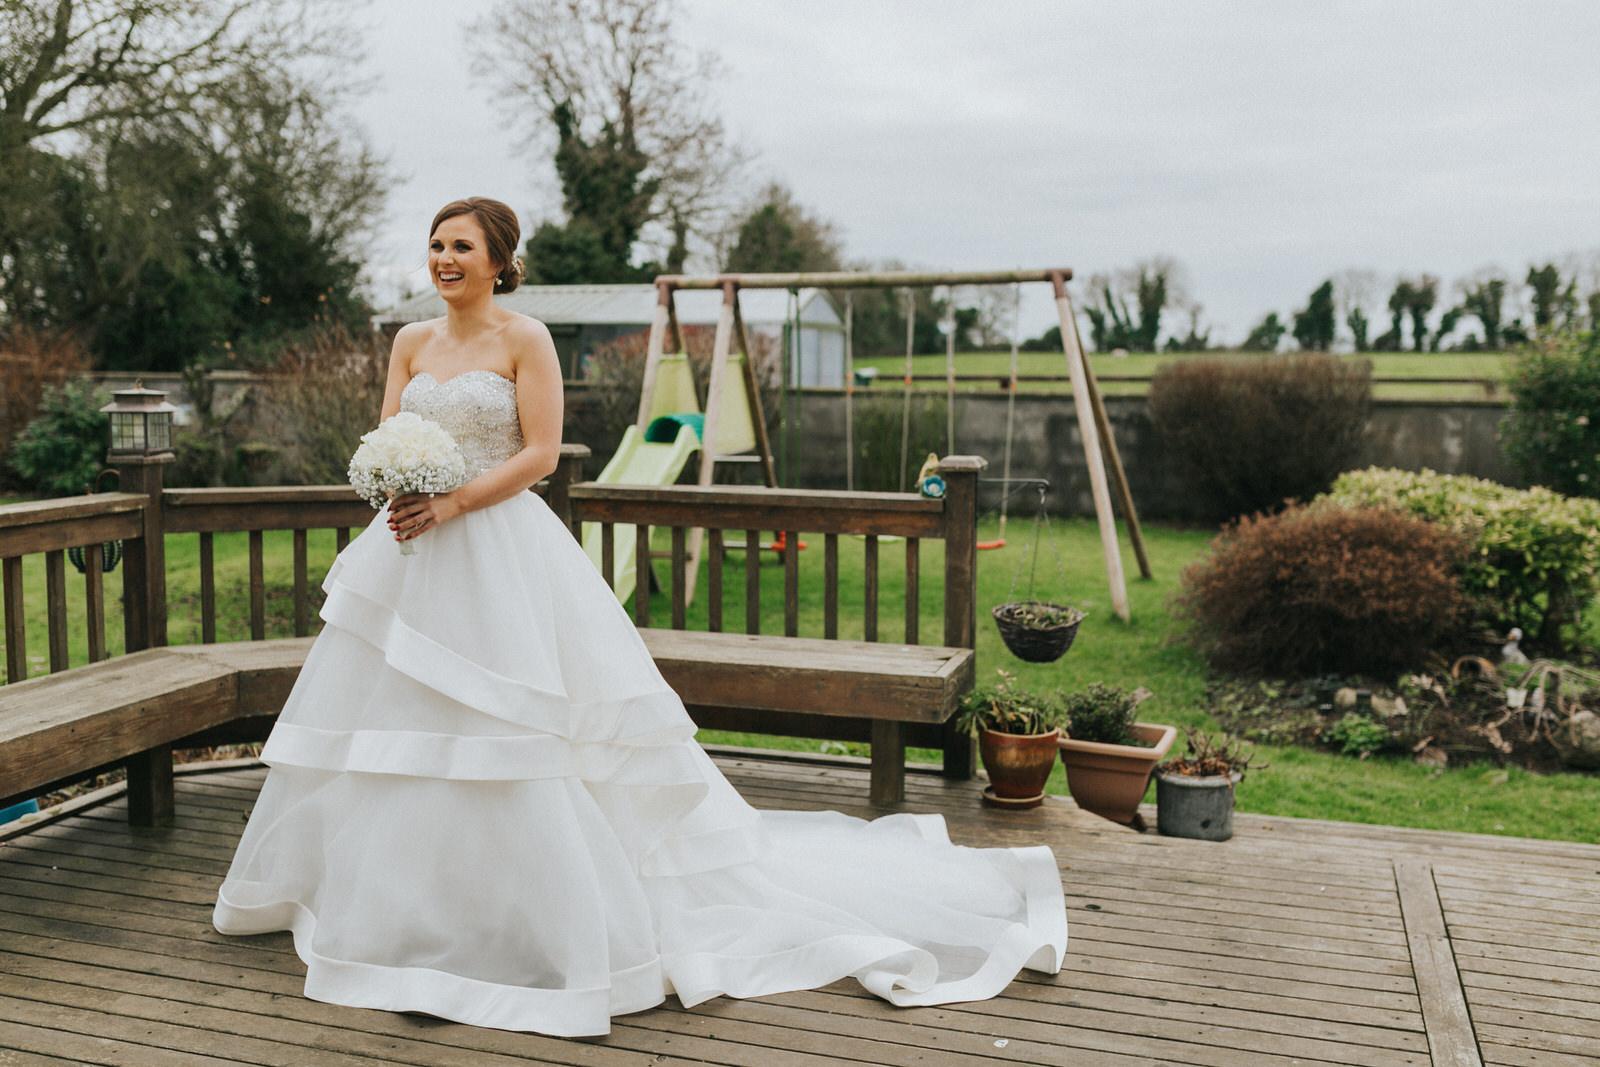 Clonabreany_wedding-photographer_roger_kenny_ireland_031.jpg